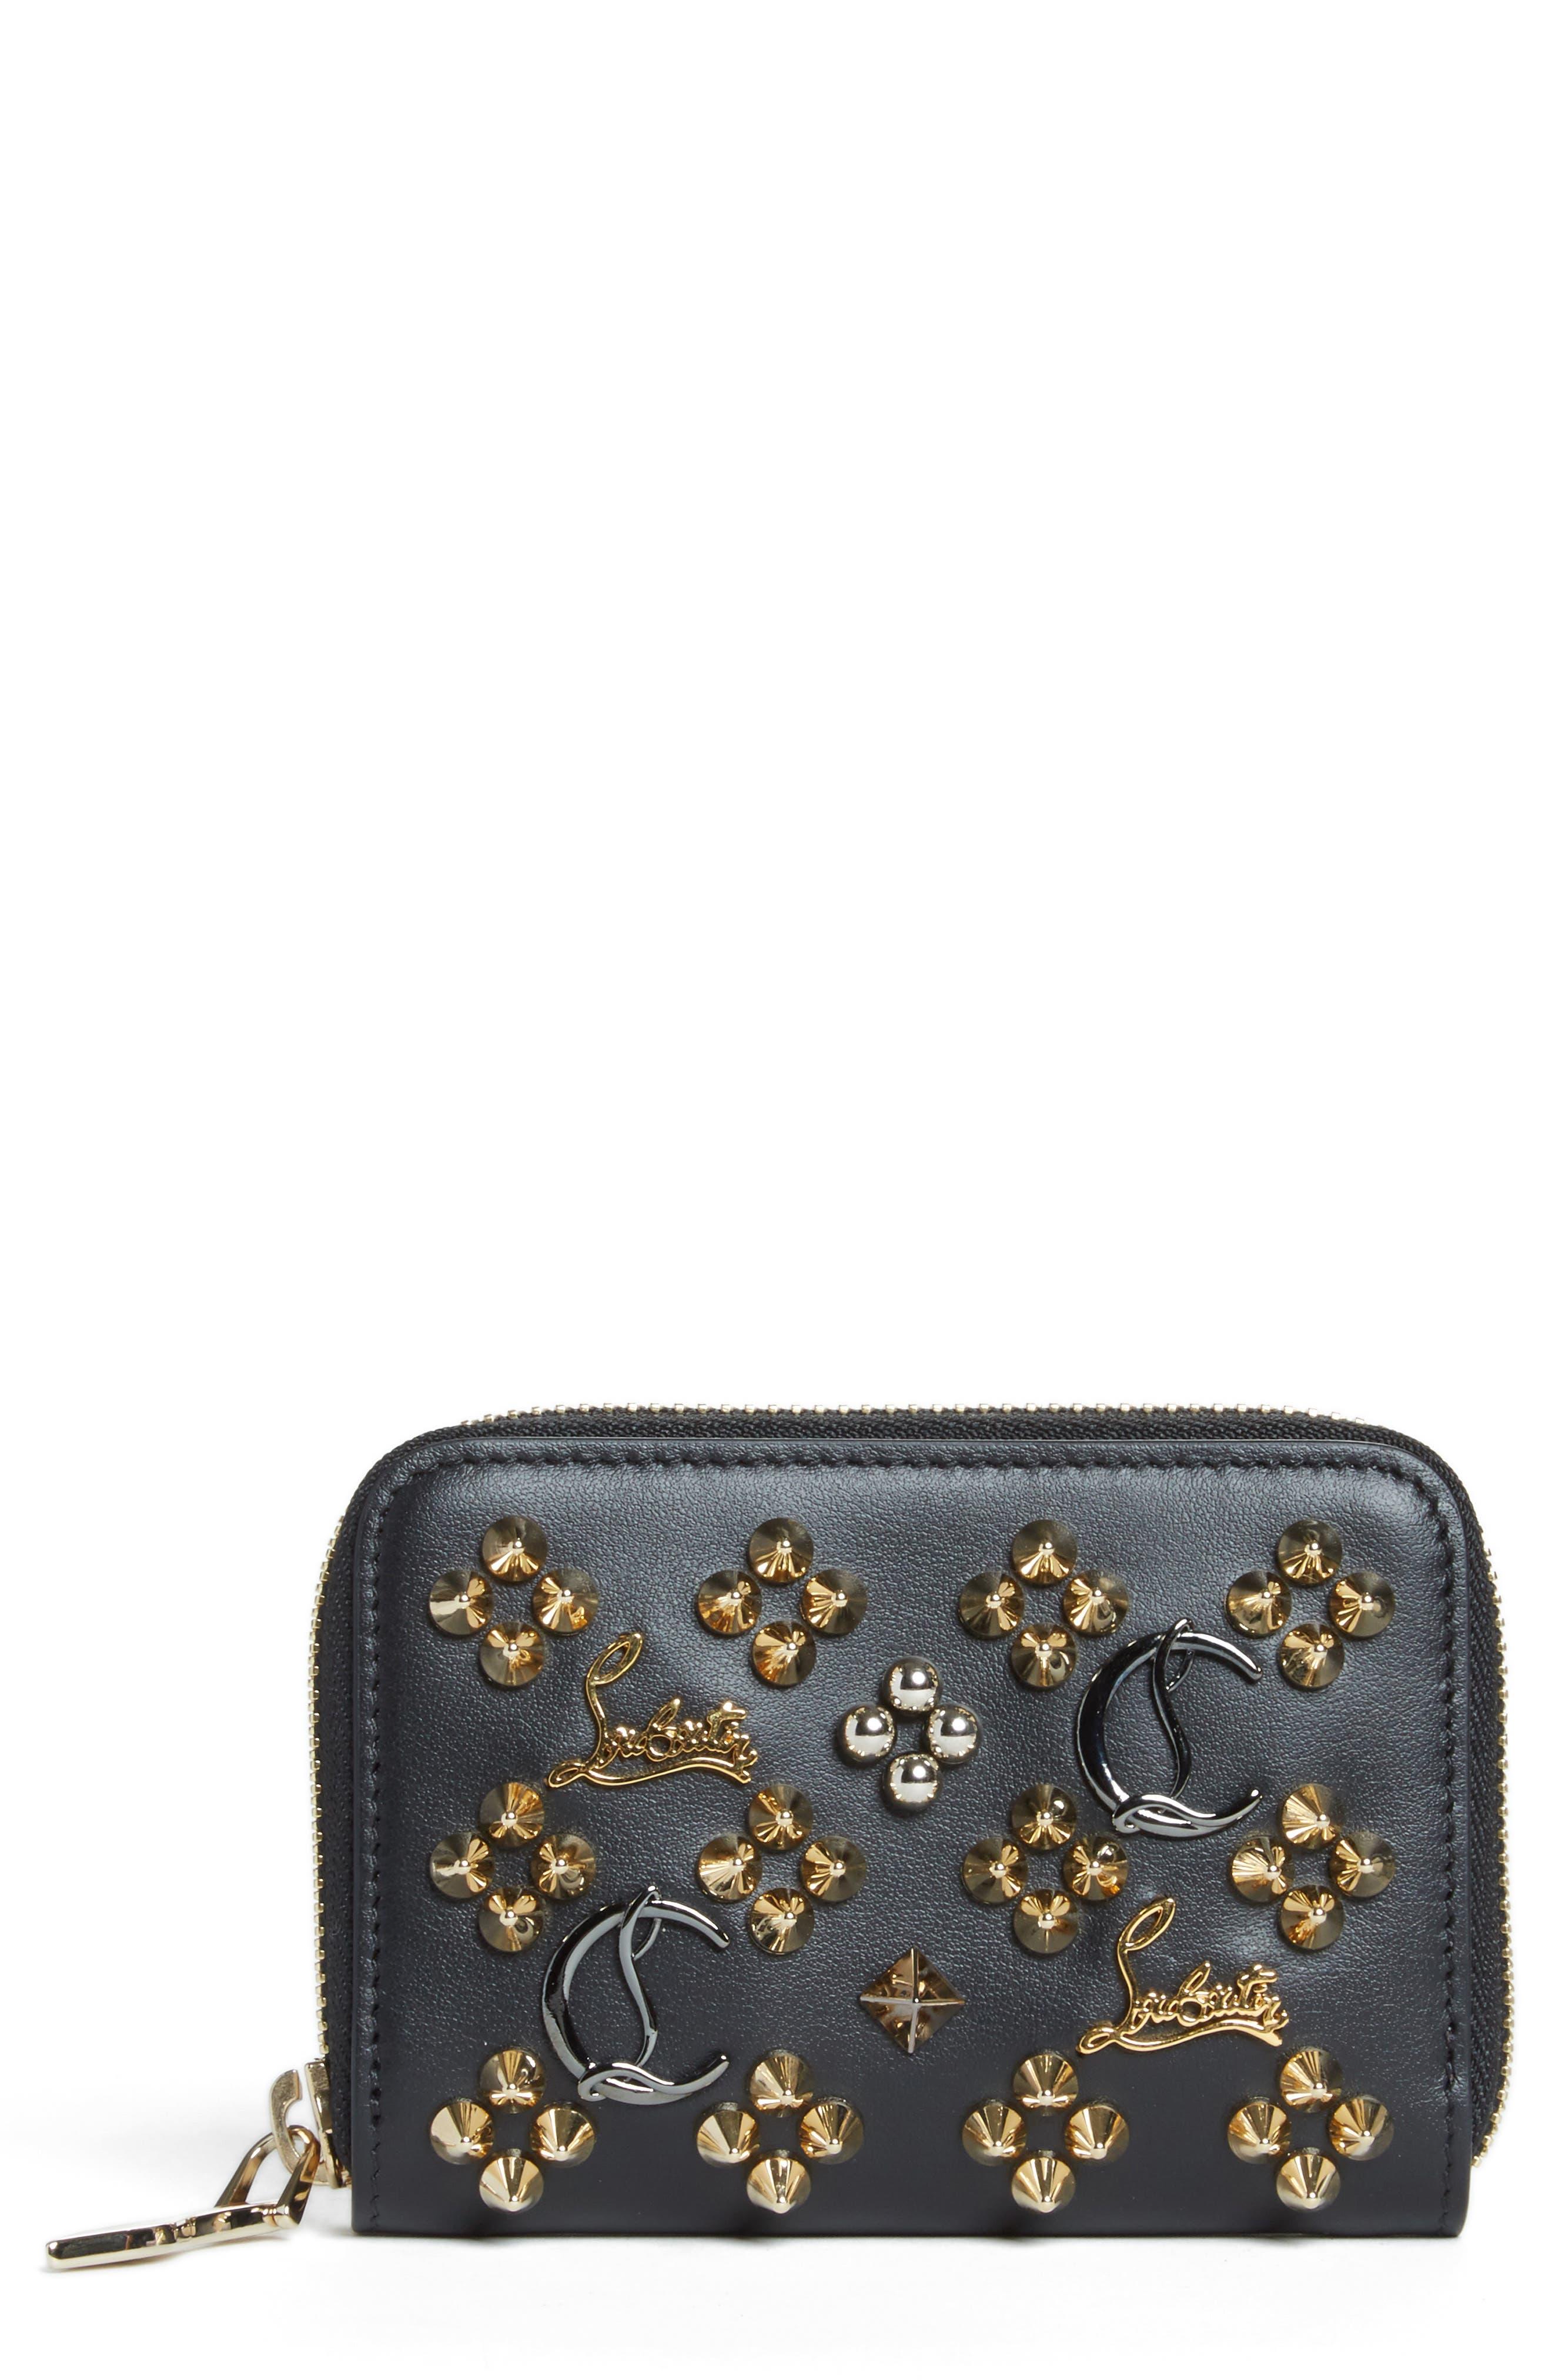 CHRISTIAN LOUBOUTIN Panettone Leather Coin Purse, Main, color, BLACK/MULTIMETAL